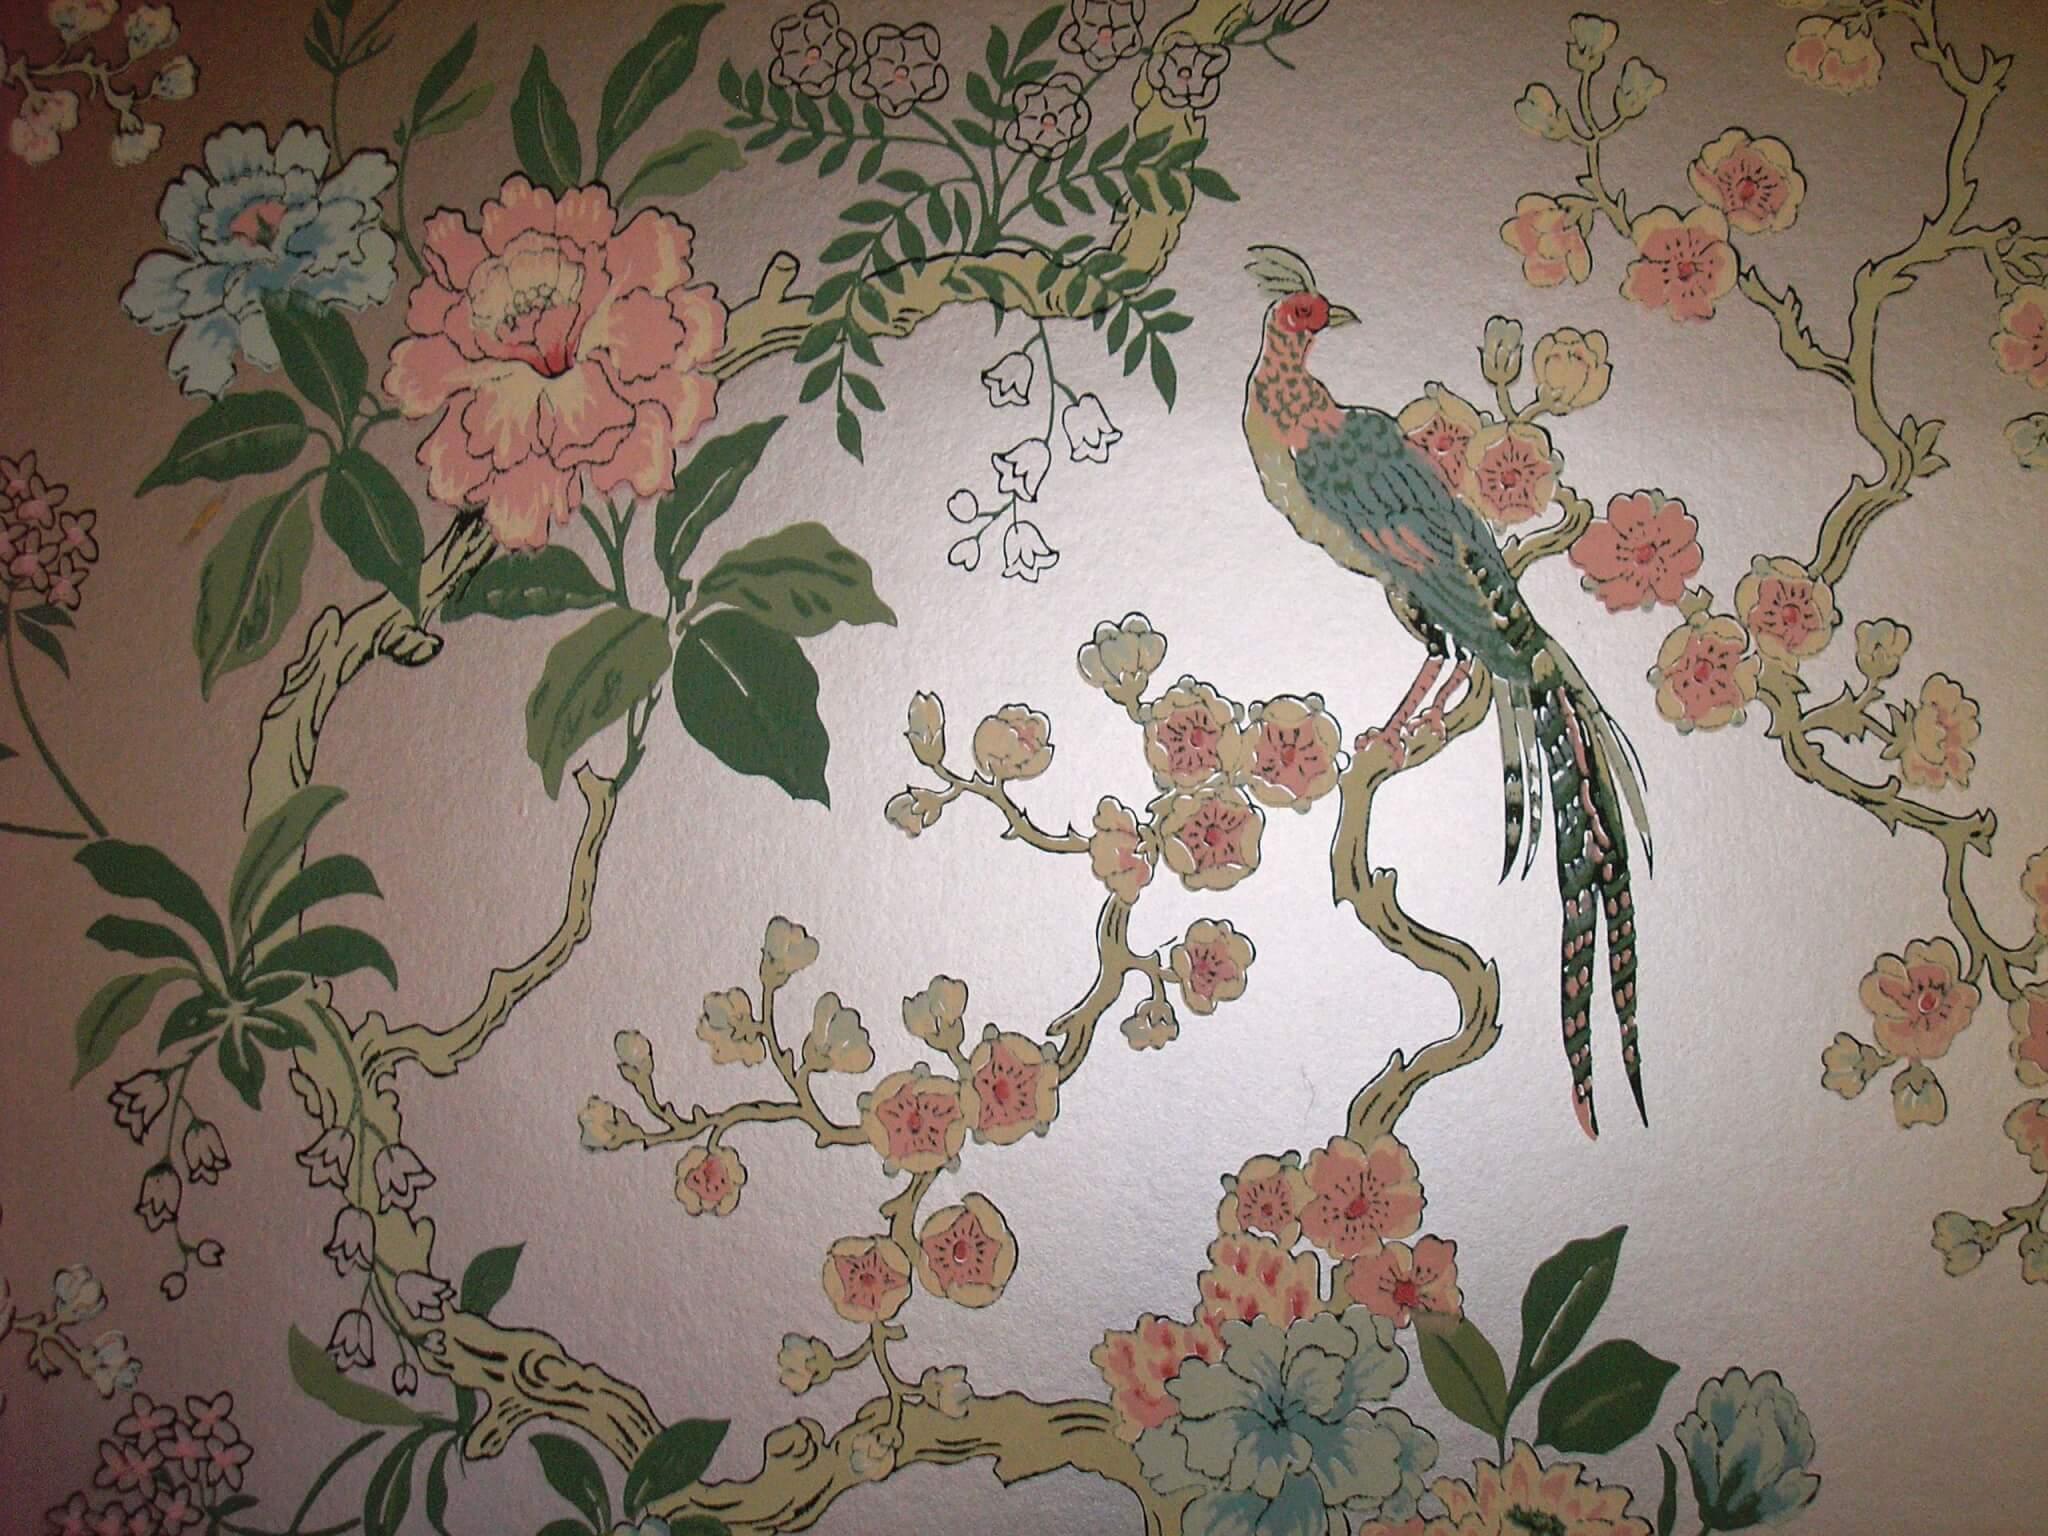 dining room pheasant vintage wallpaper Retro Renovation : a5 from retrorenovation.com size 2560 x 1920 jpeg 870kB